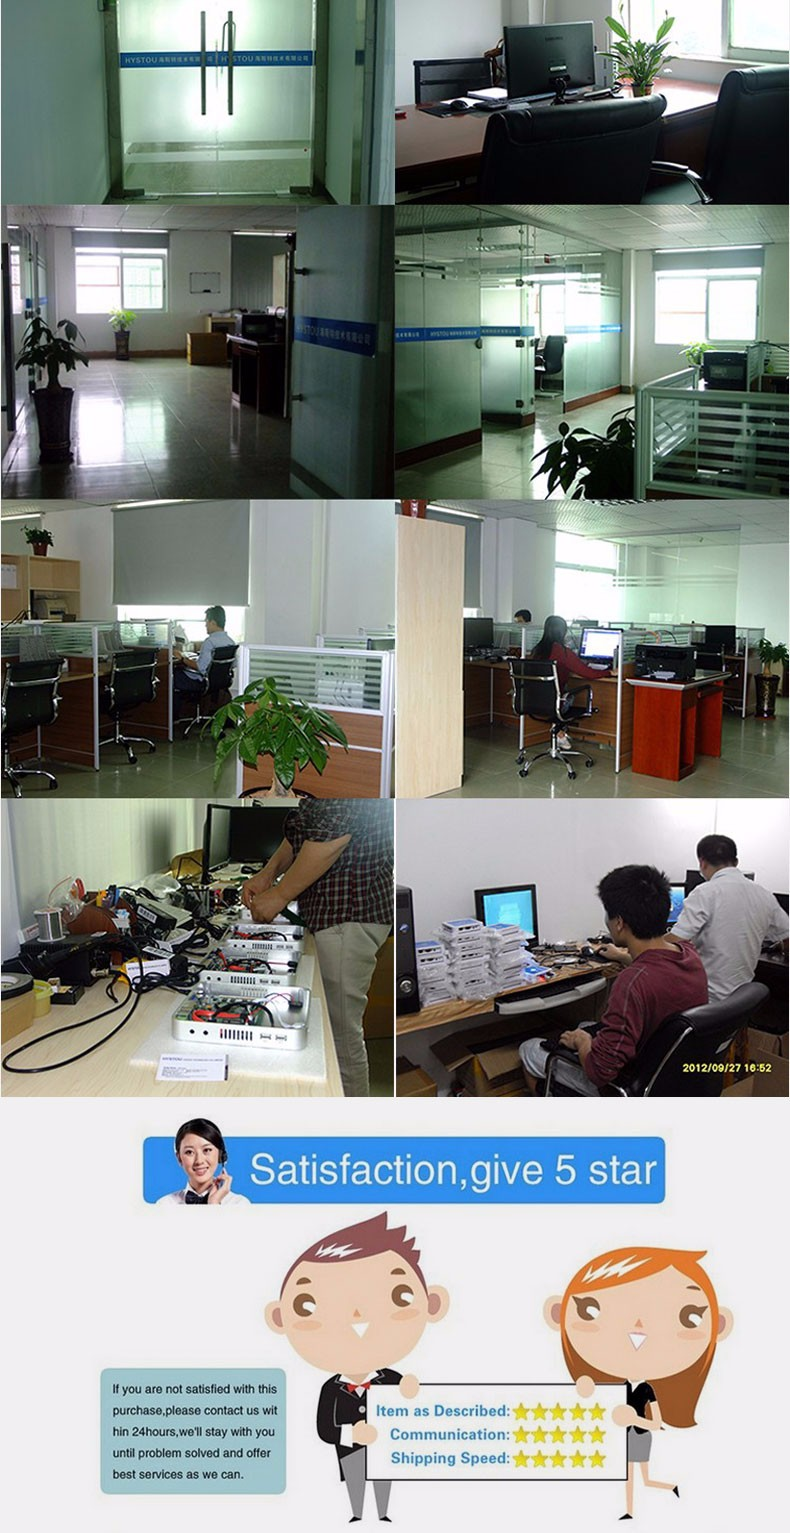 Core-i3-5005U-Mini-PC-4K-Ultra-HD-3D-Blu-Ray-Mini-PC-Windows-Mini-Computer-USB-3_03_03